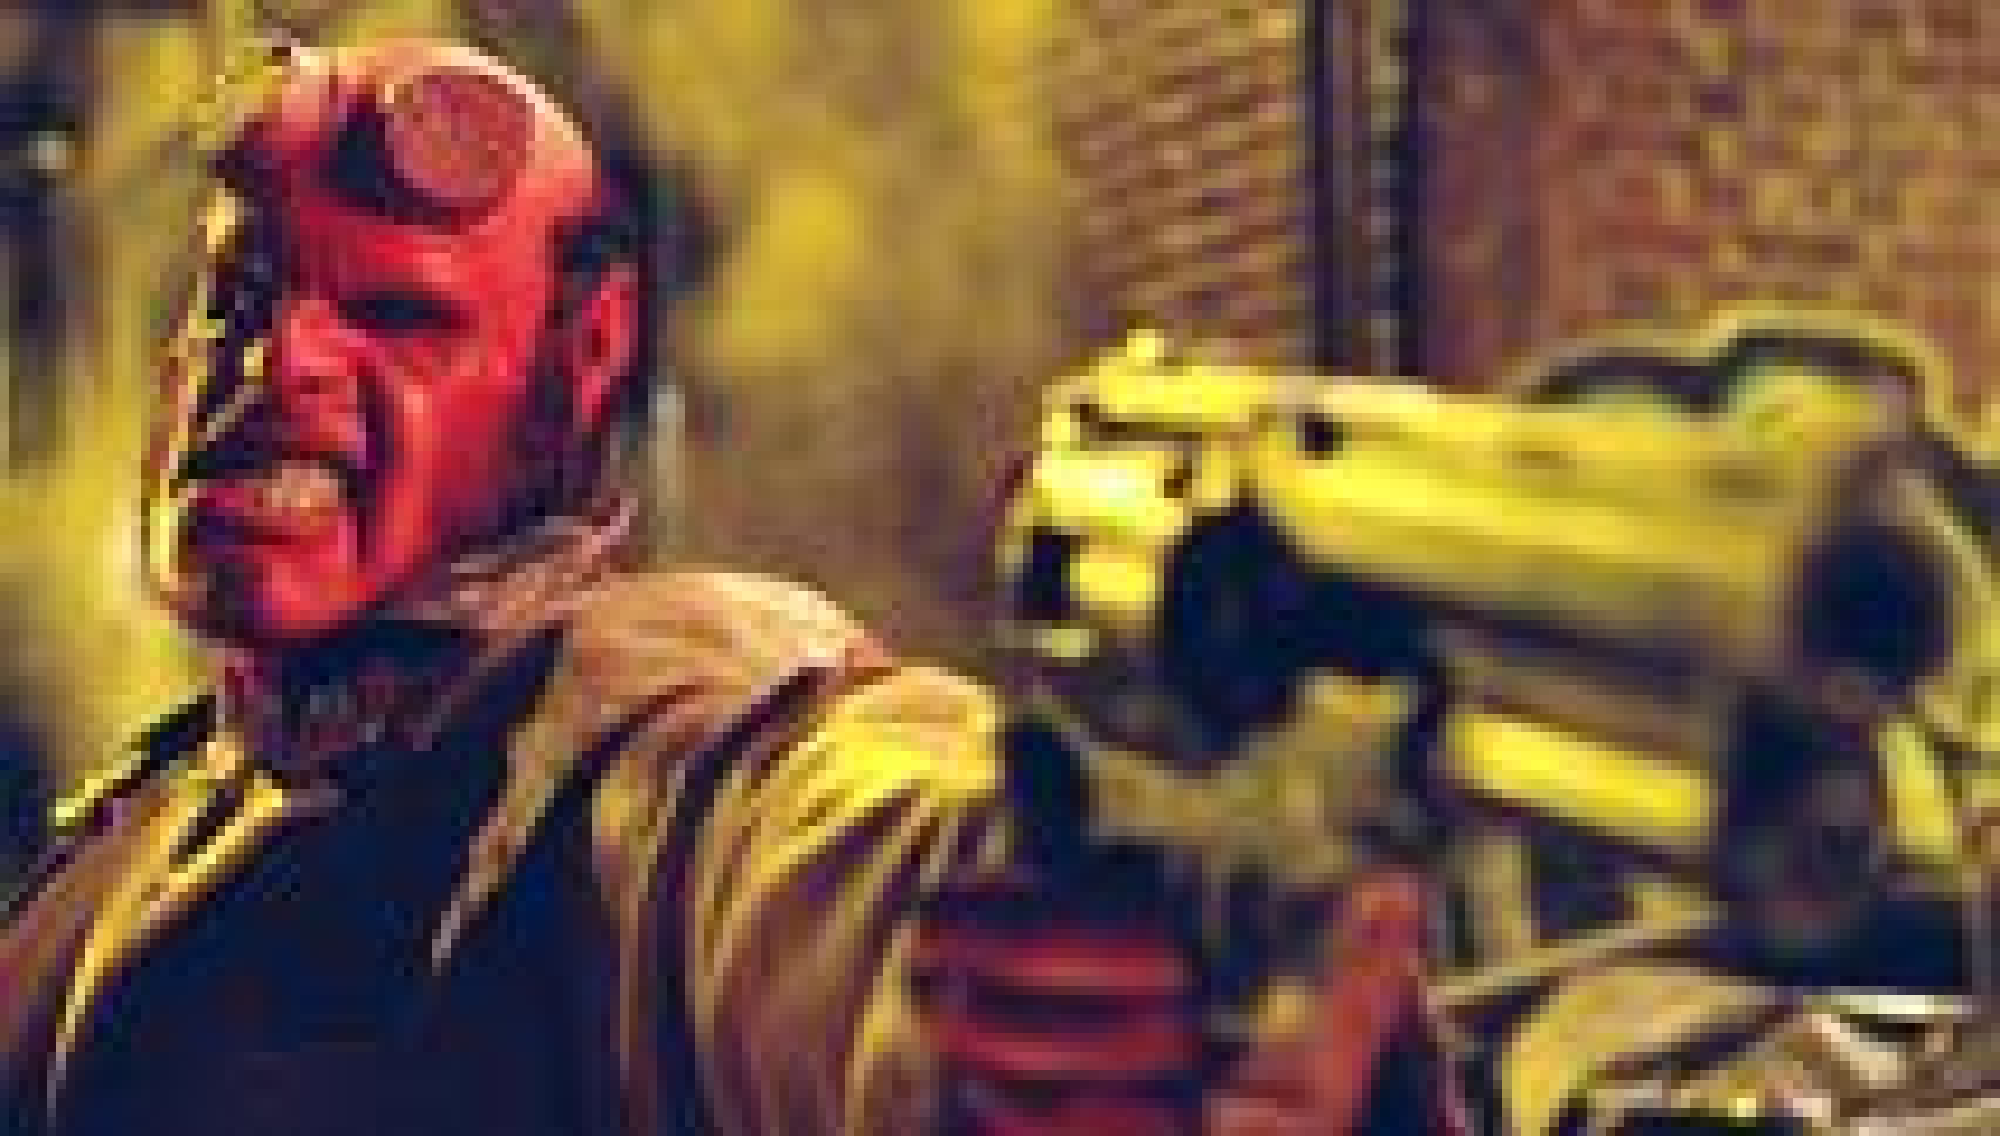 Lovecraft etter Hellboy 2?